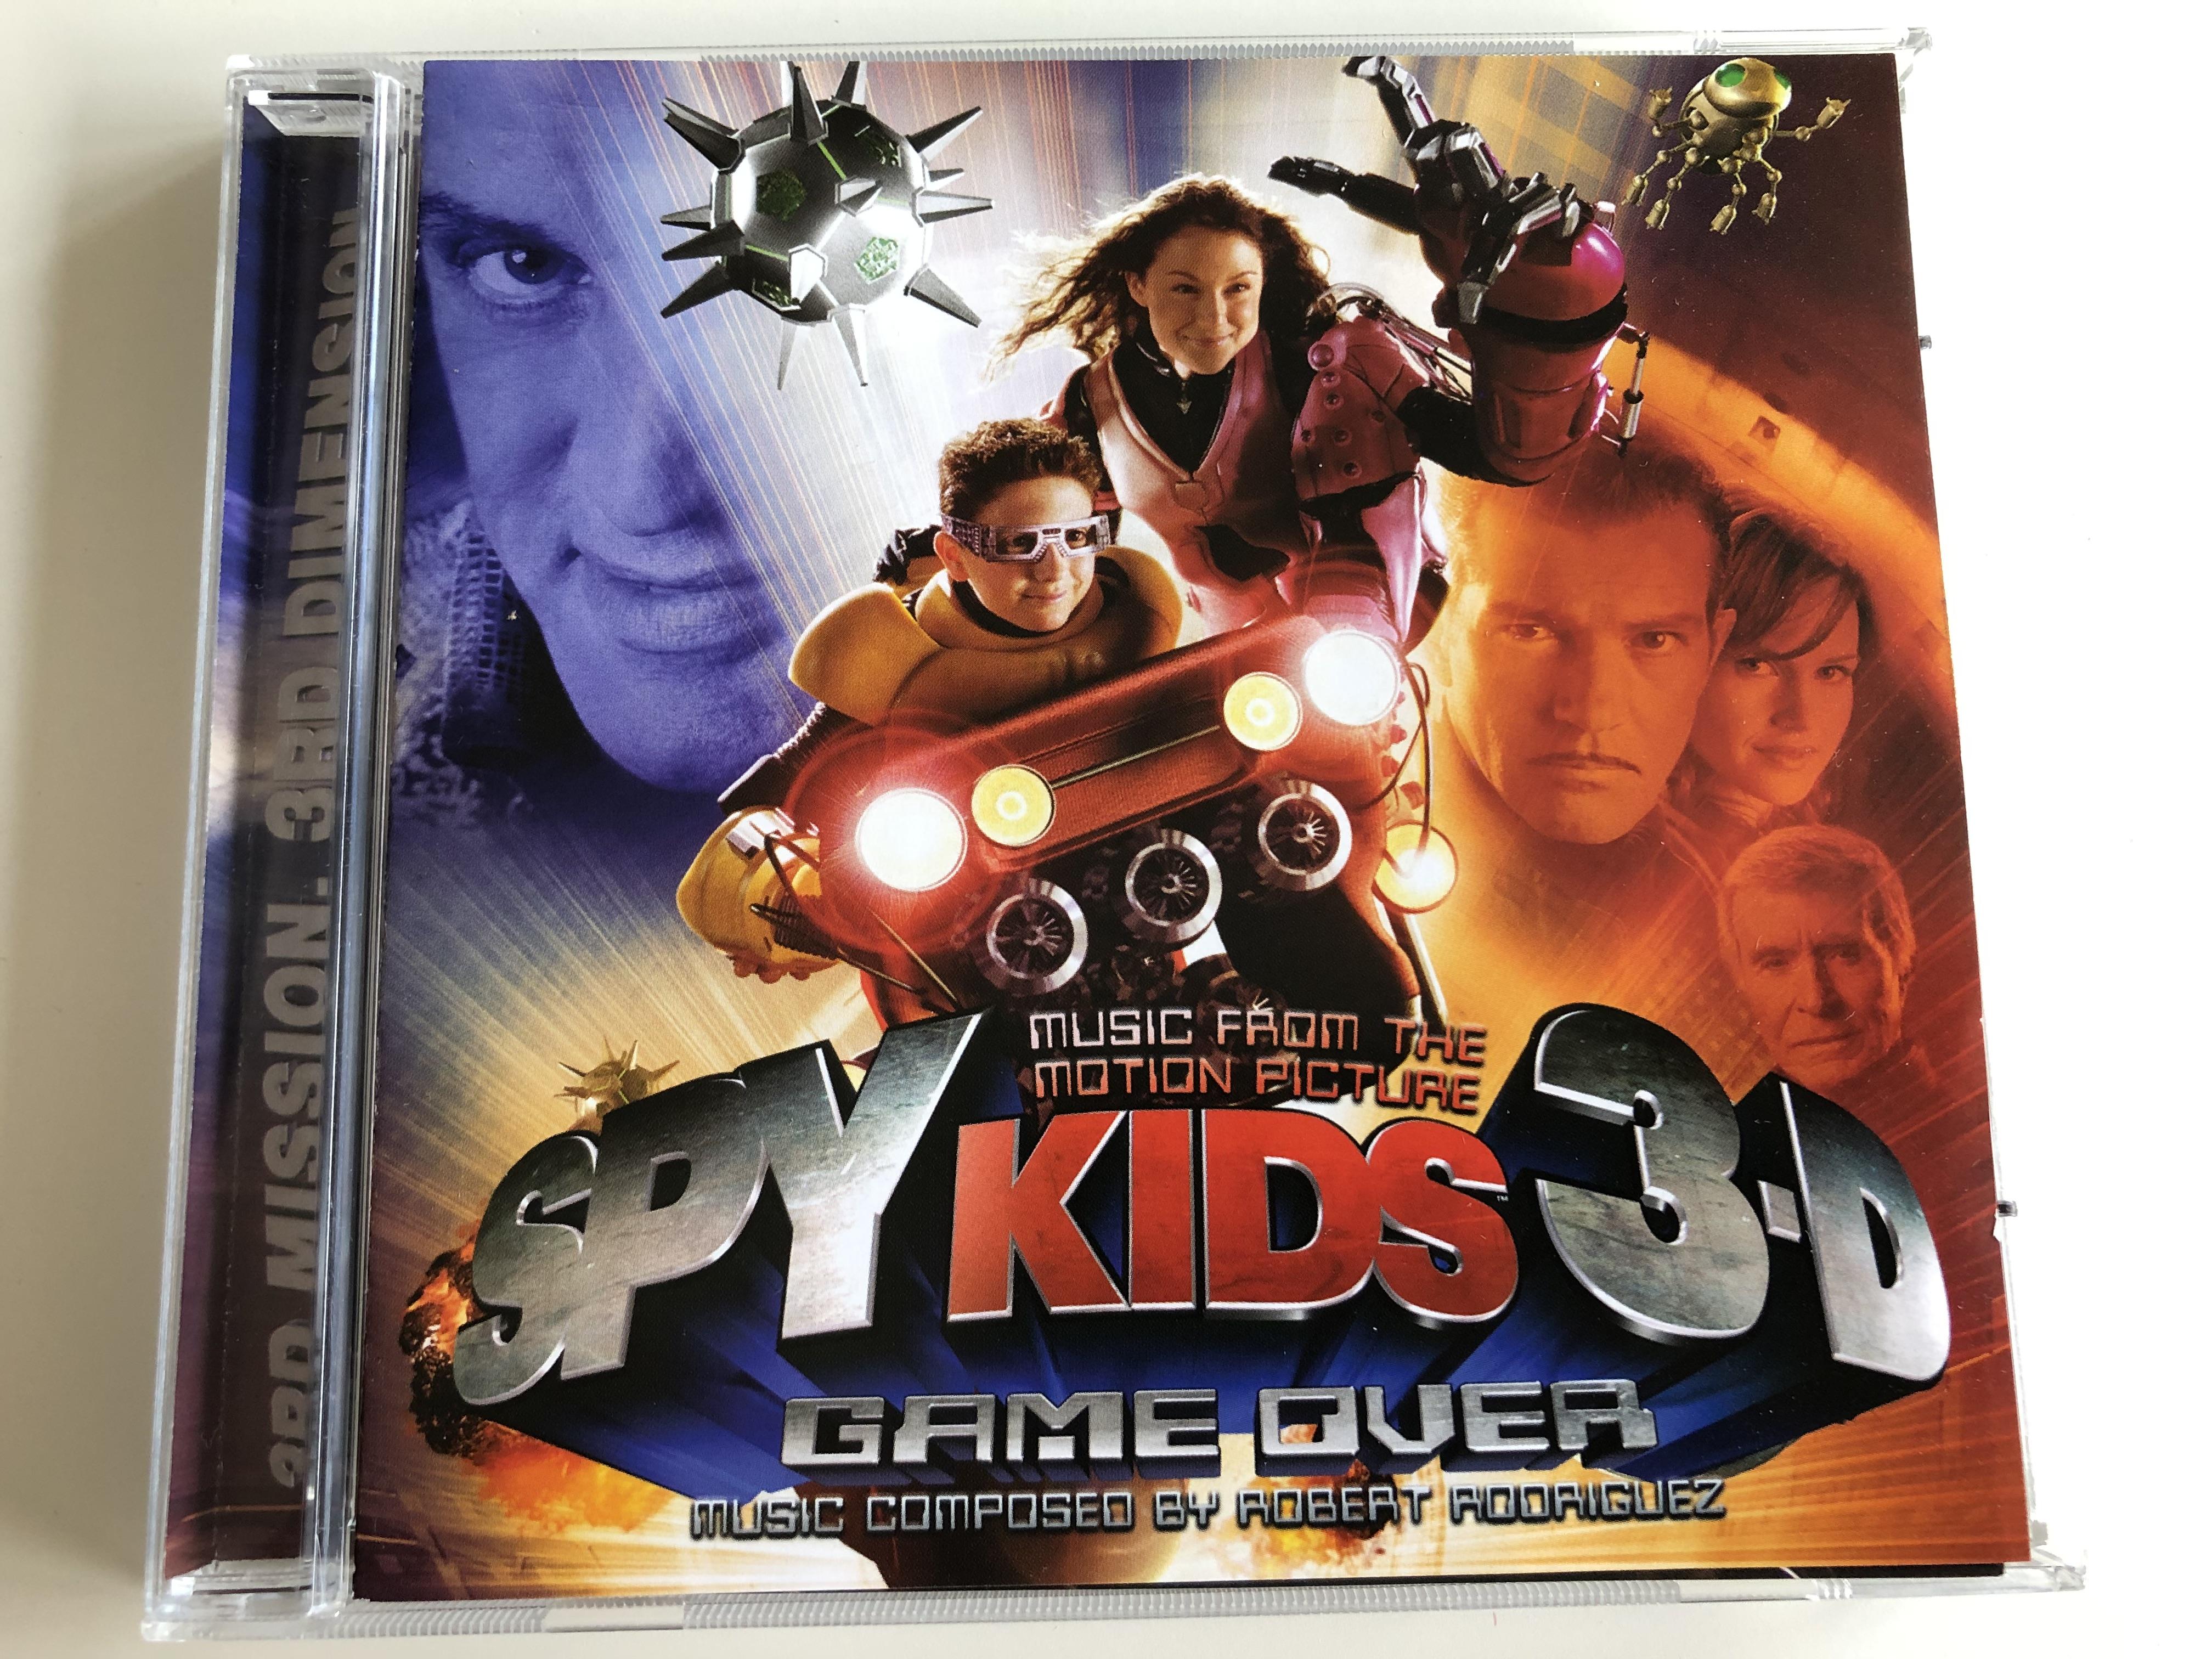 spy-kids-3d-game-overimg-2672.jpg